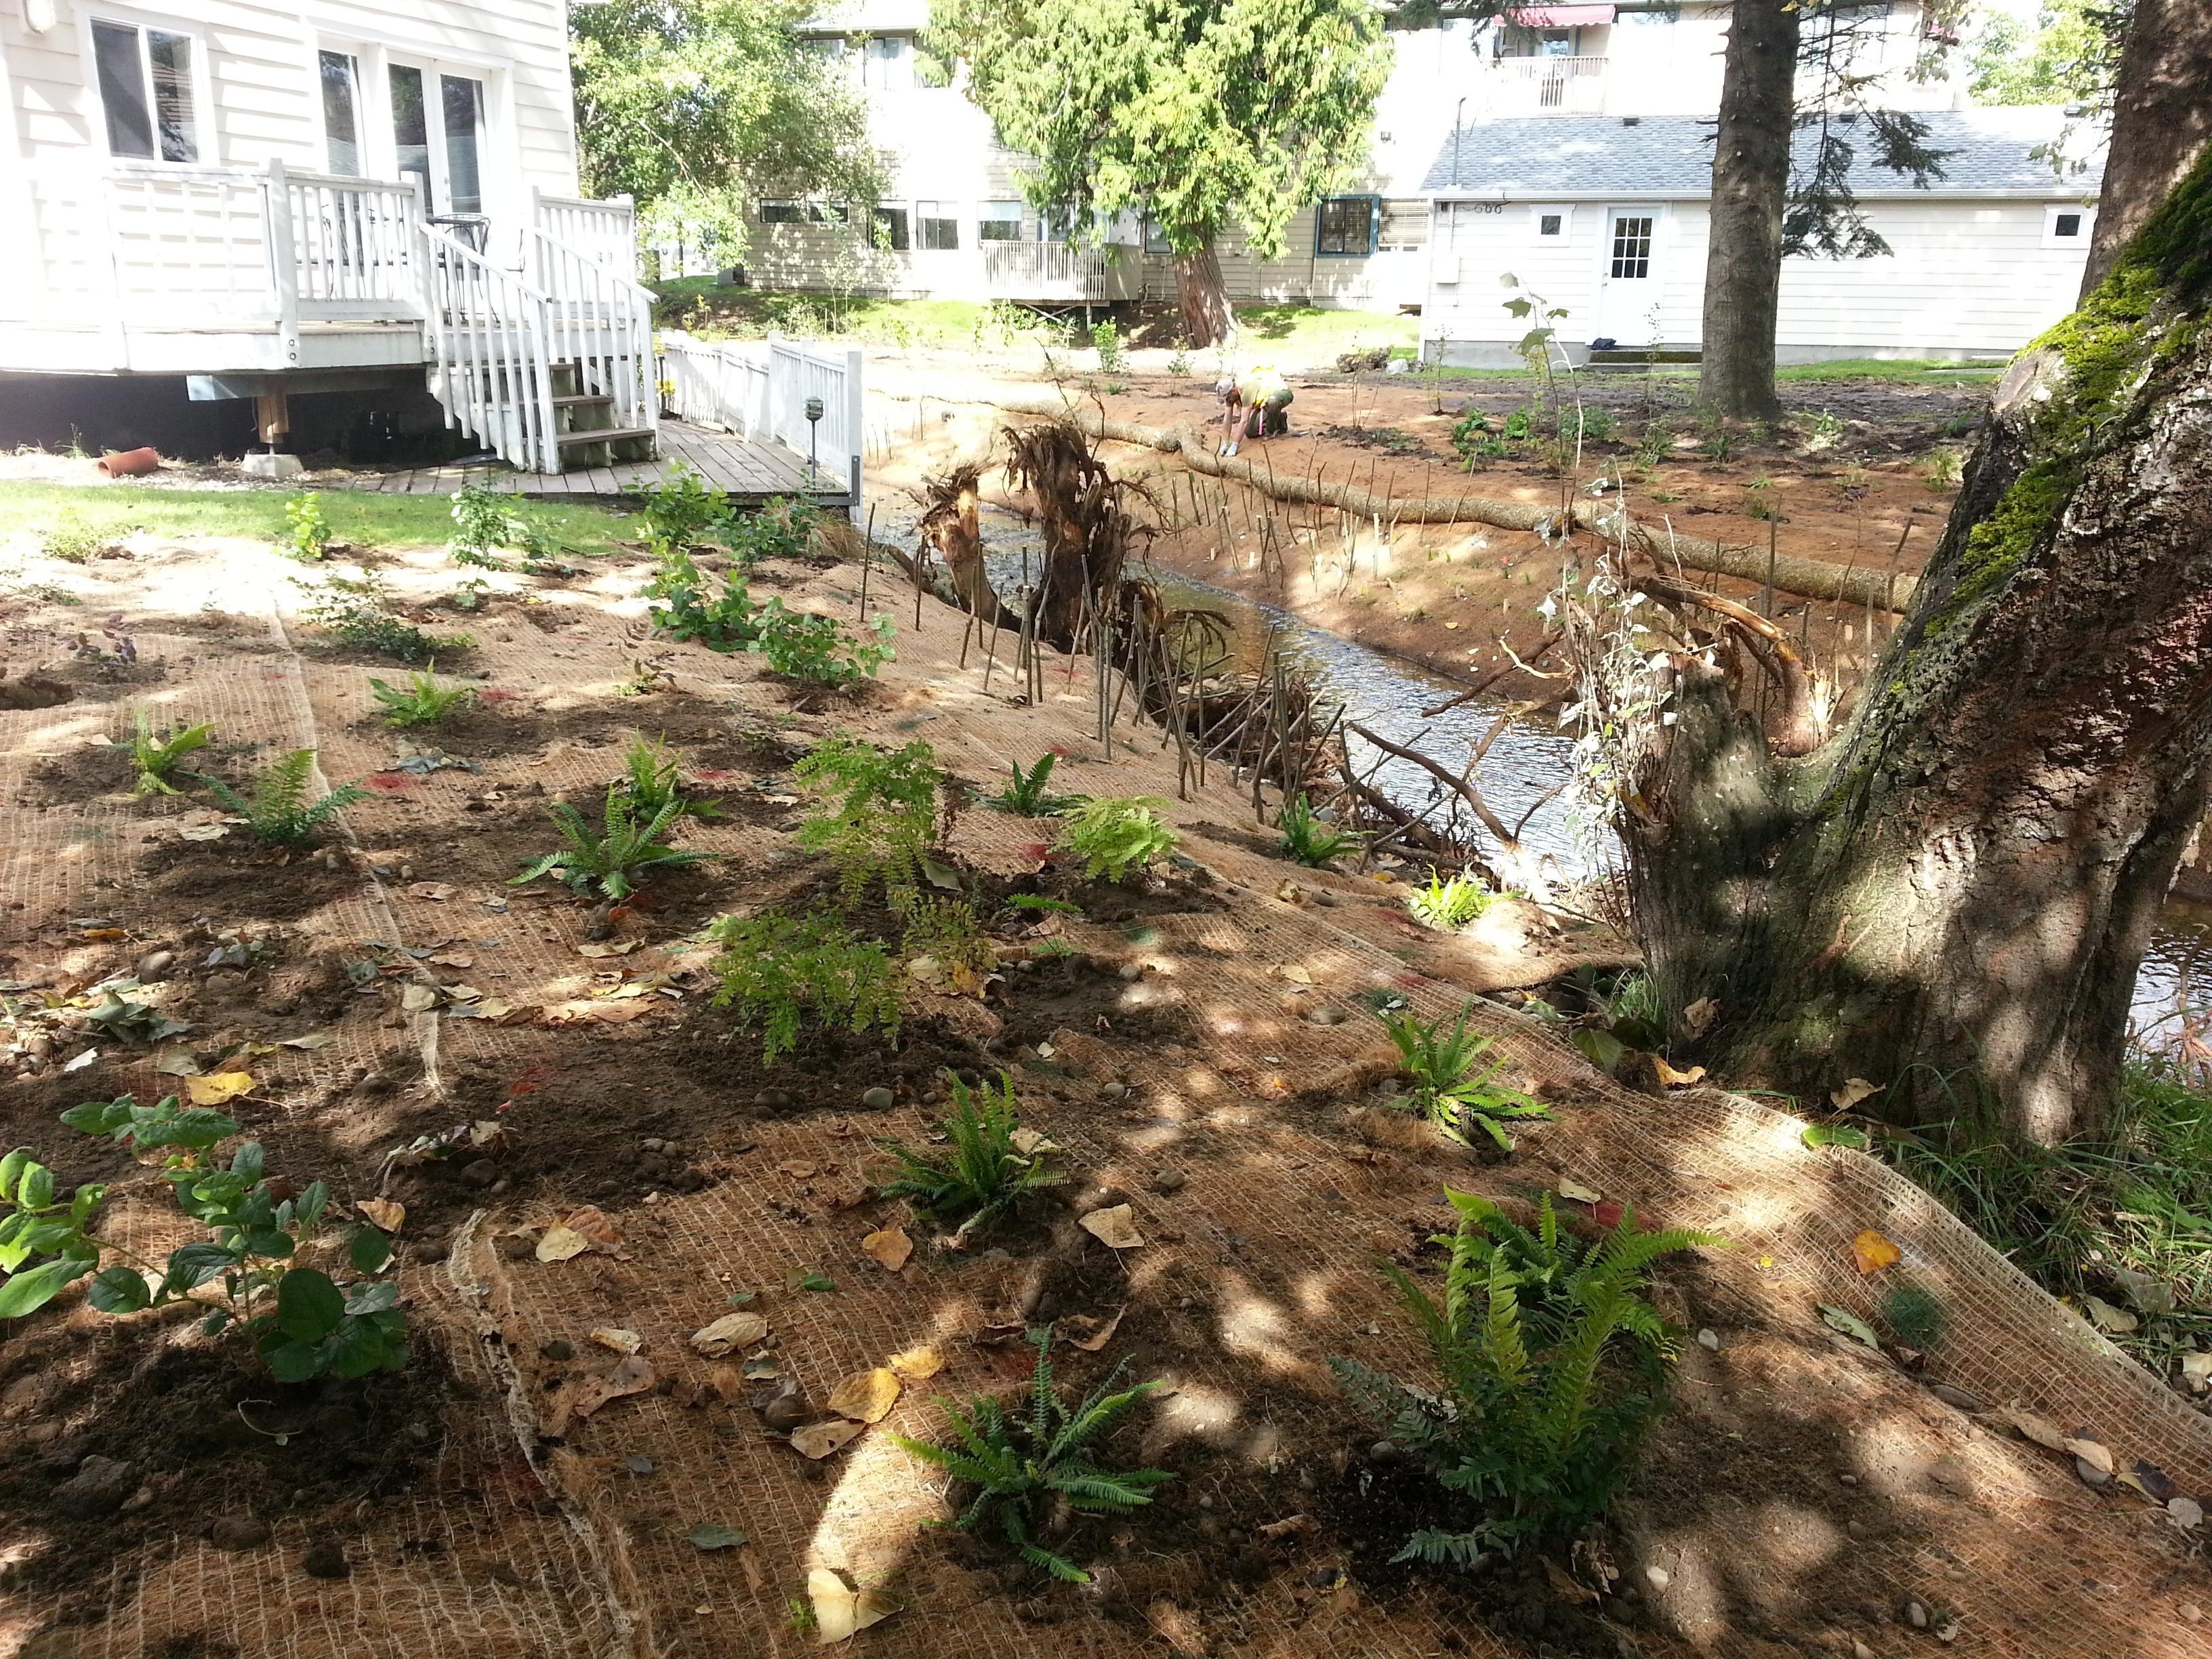 Backyard habitat grant planting and stream restoration.